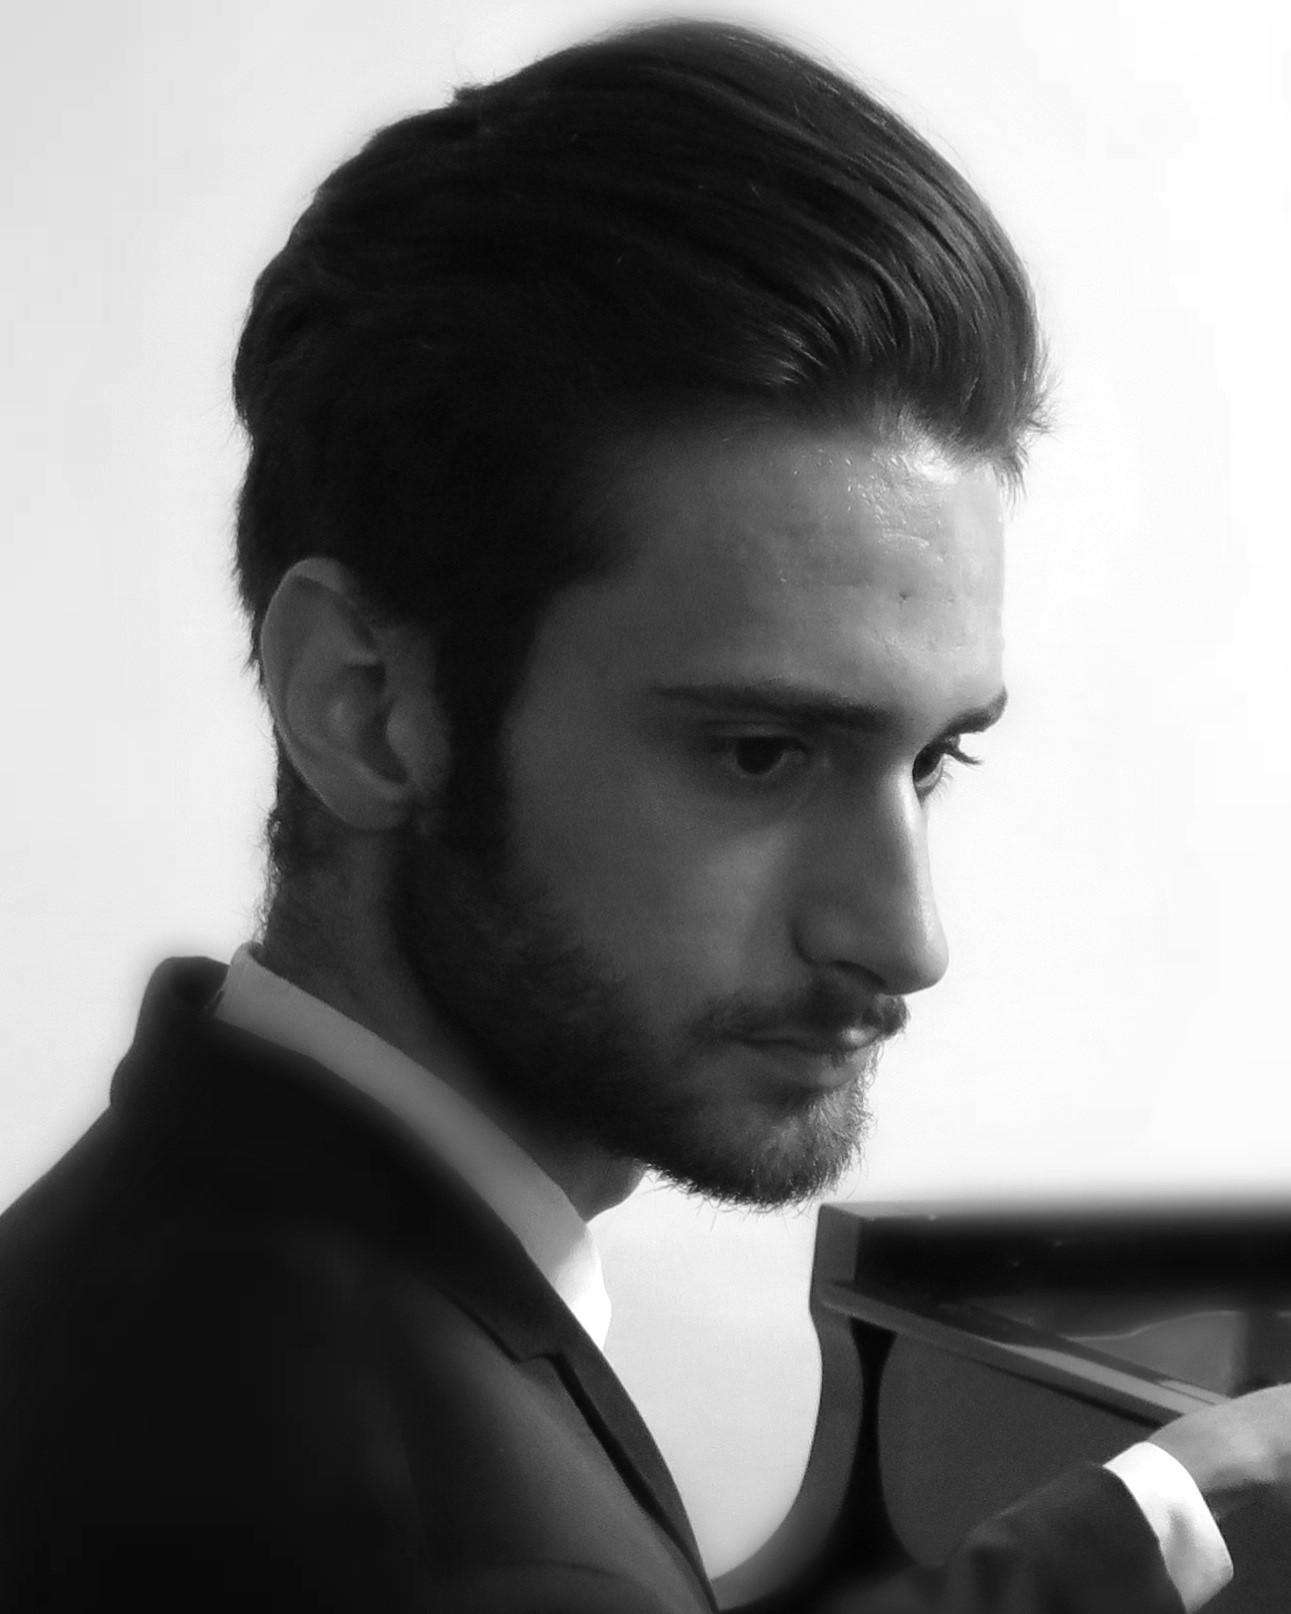 Matteo Catalano